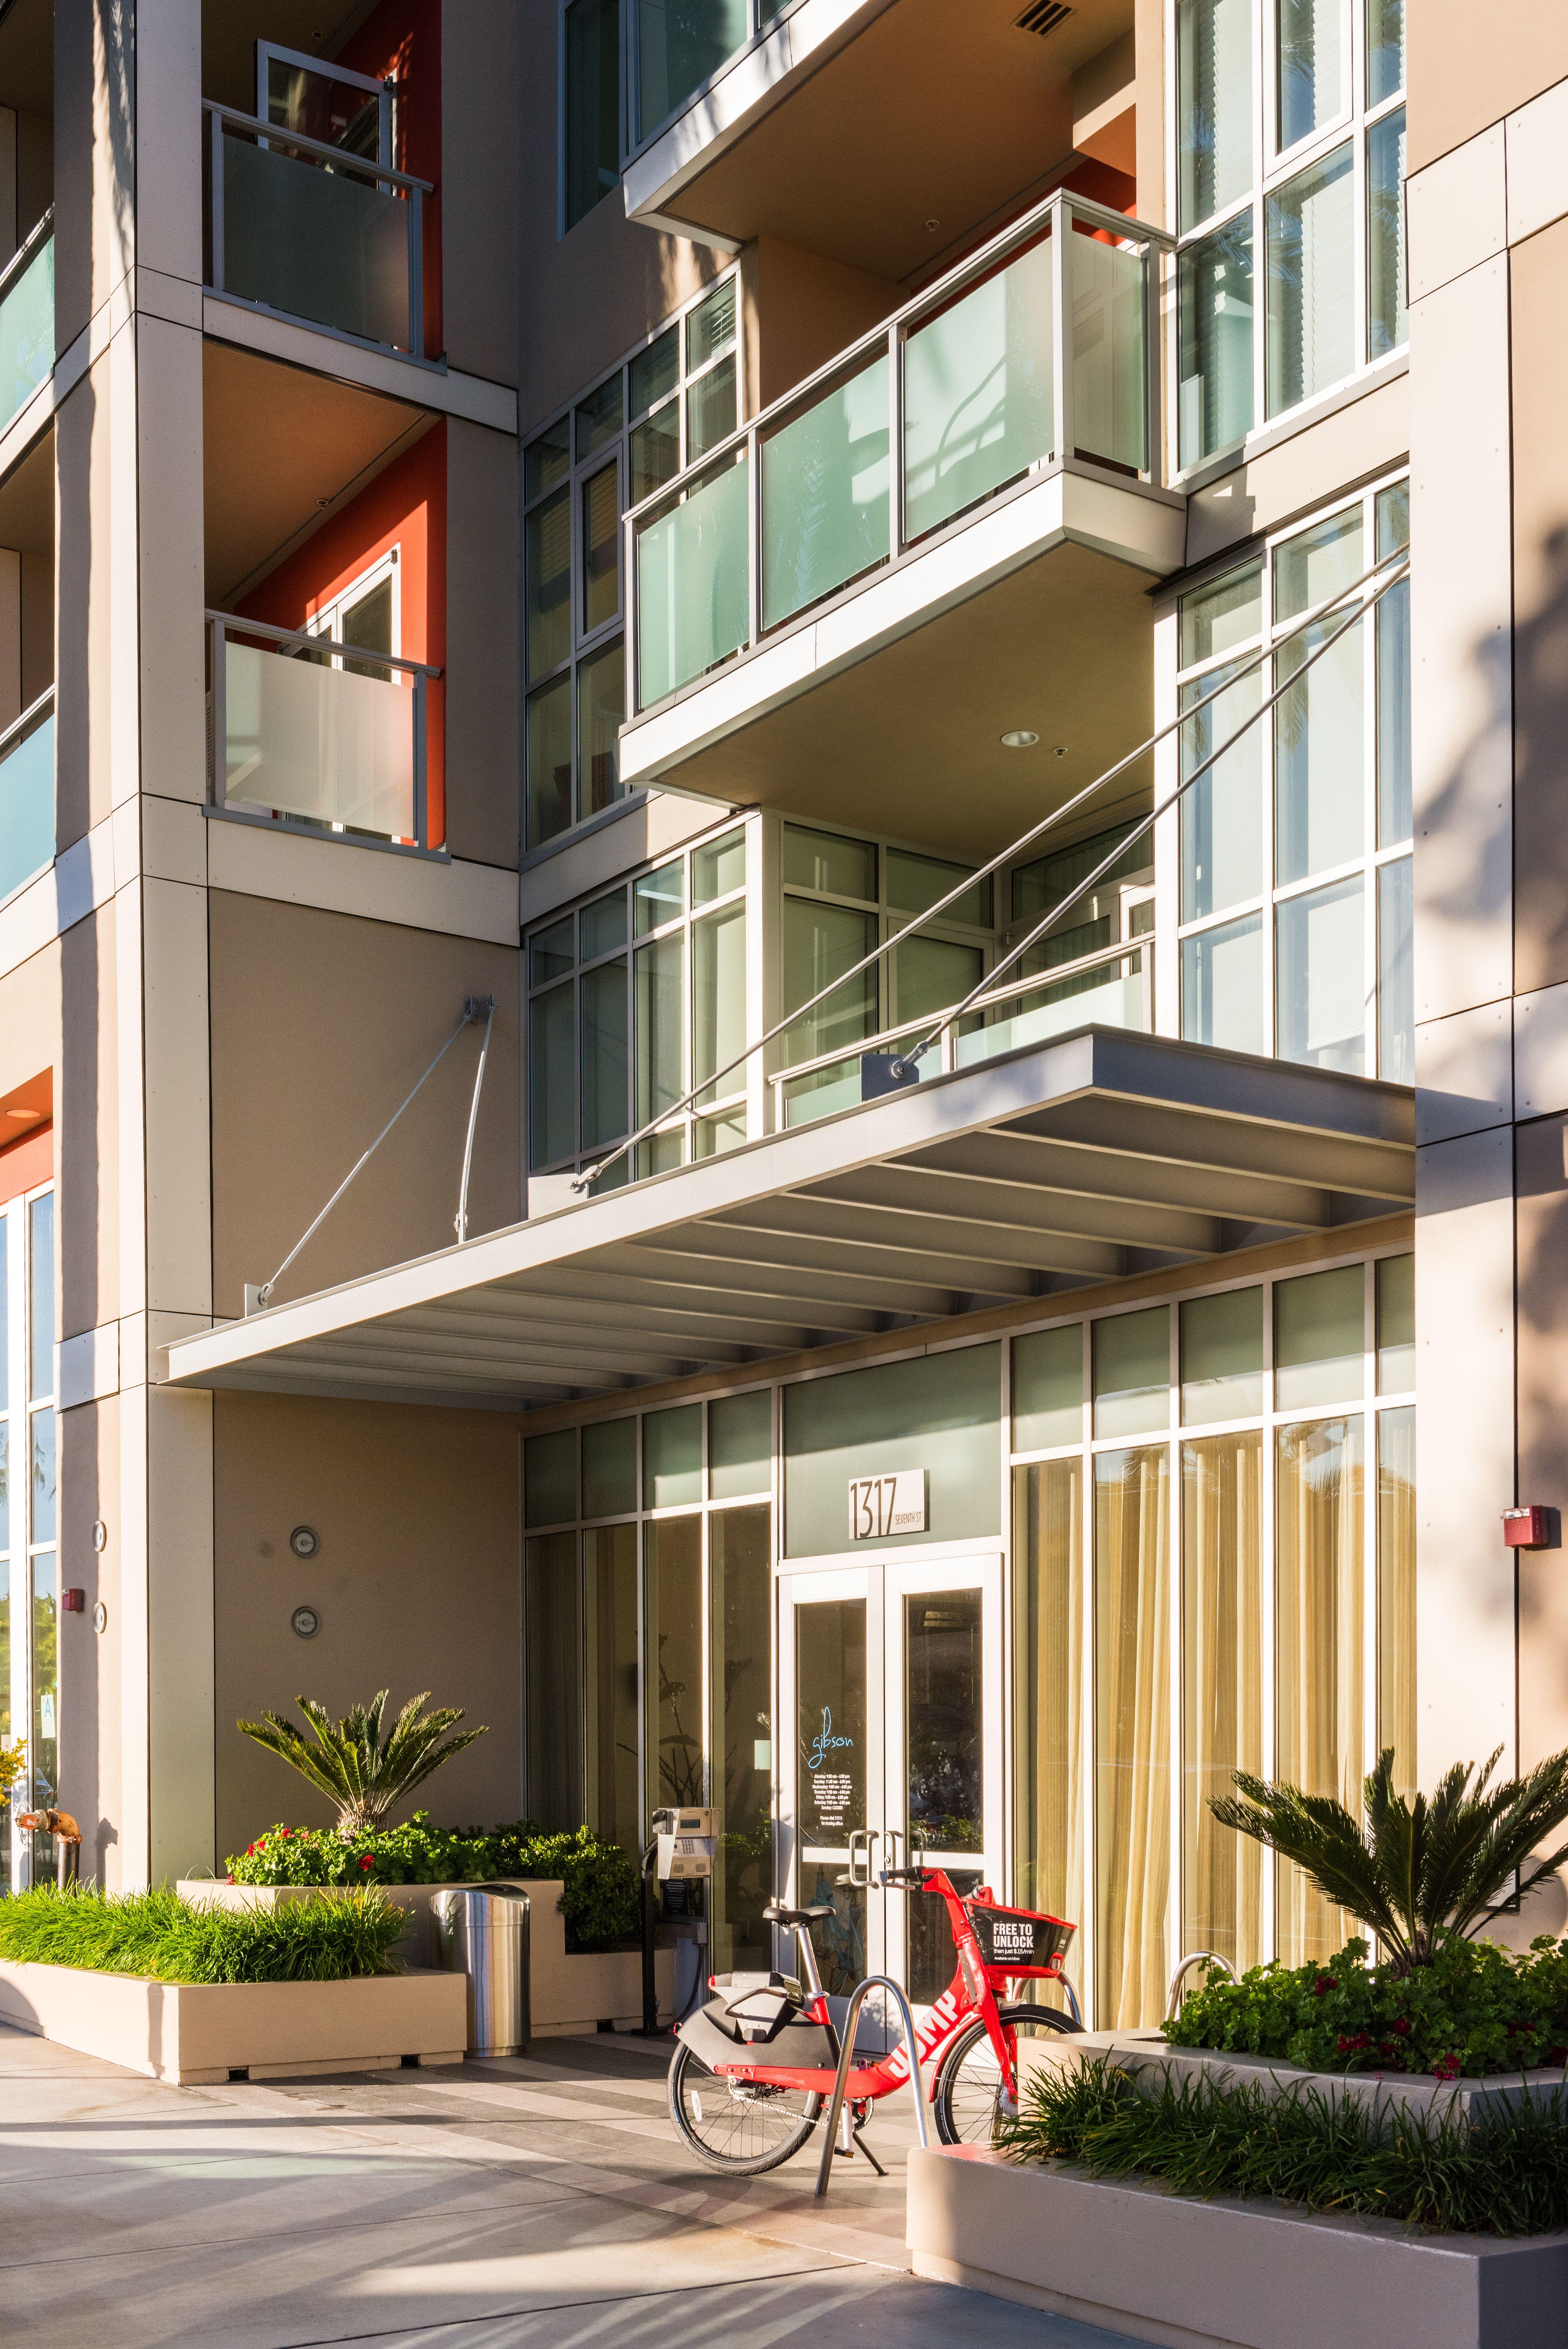 Gibson Santa Monica Apartment Homes Santa Monica Apartment Santa Monica House Styles